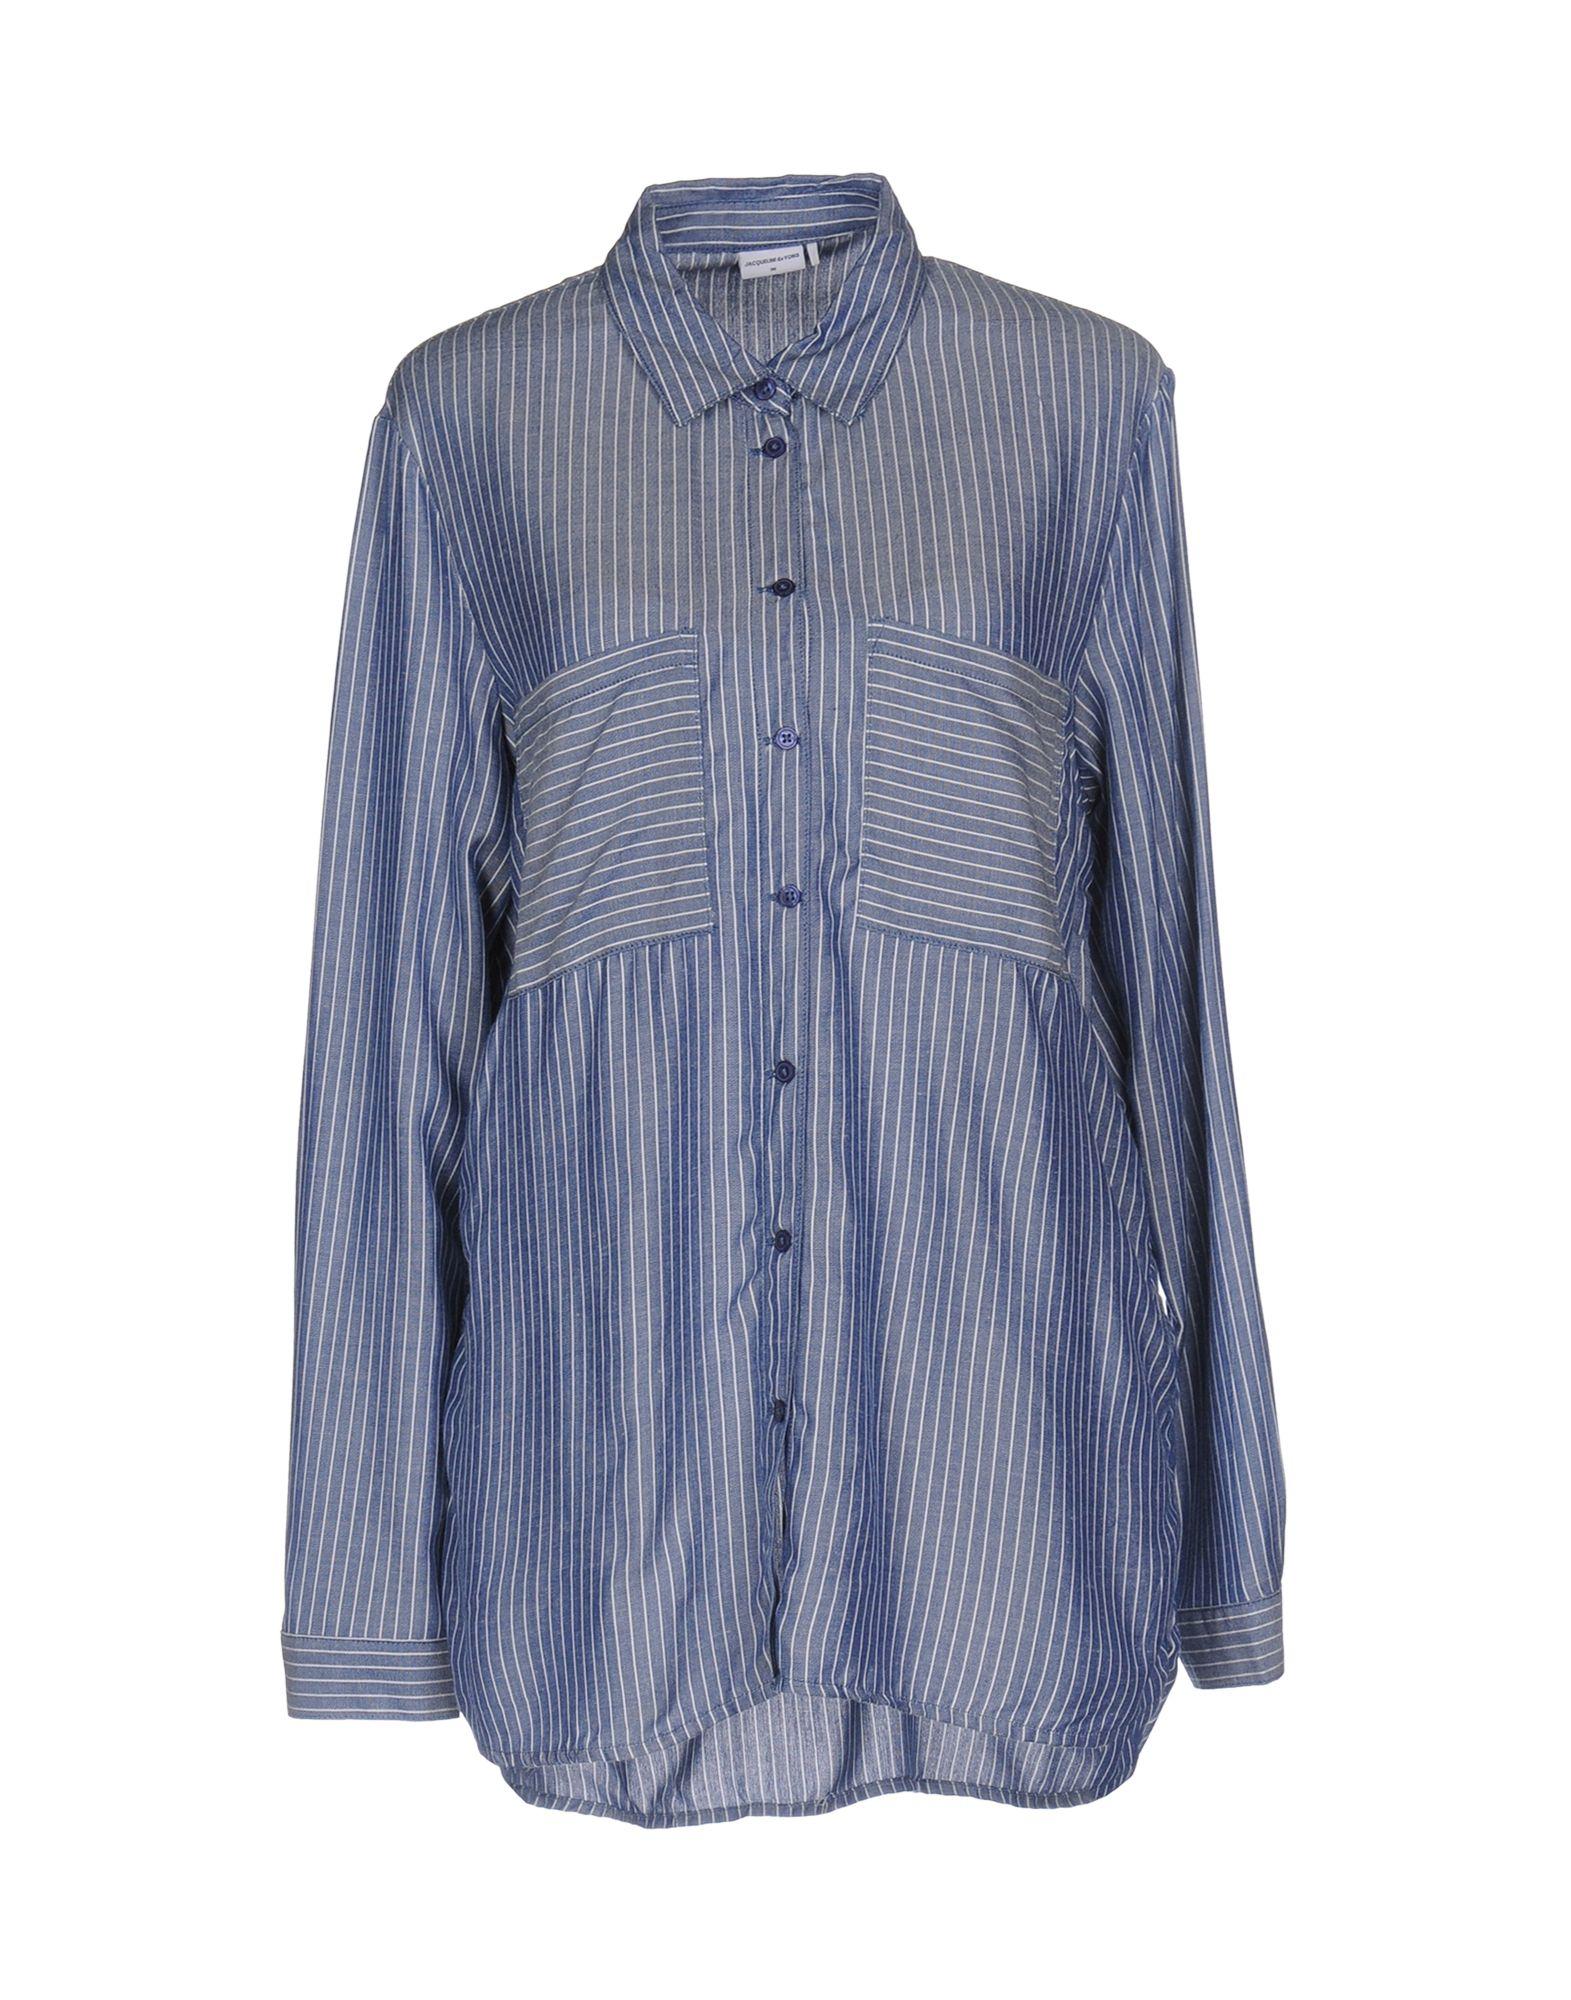 JACQUELINE de YONG Pубашка блуза jacqueline de yong jacqueline de yong ja908ewxaf30